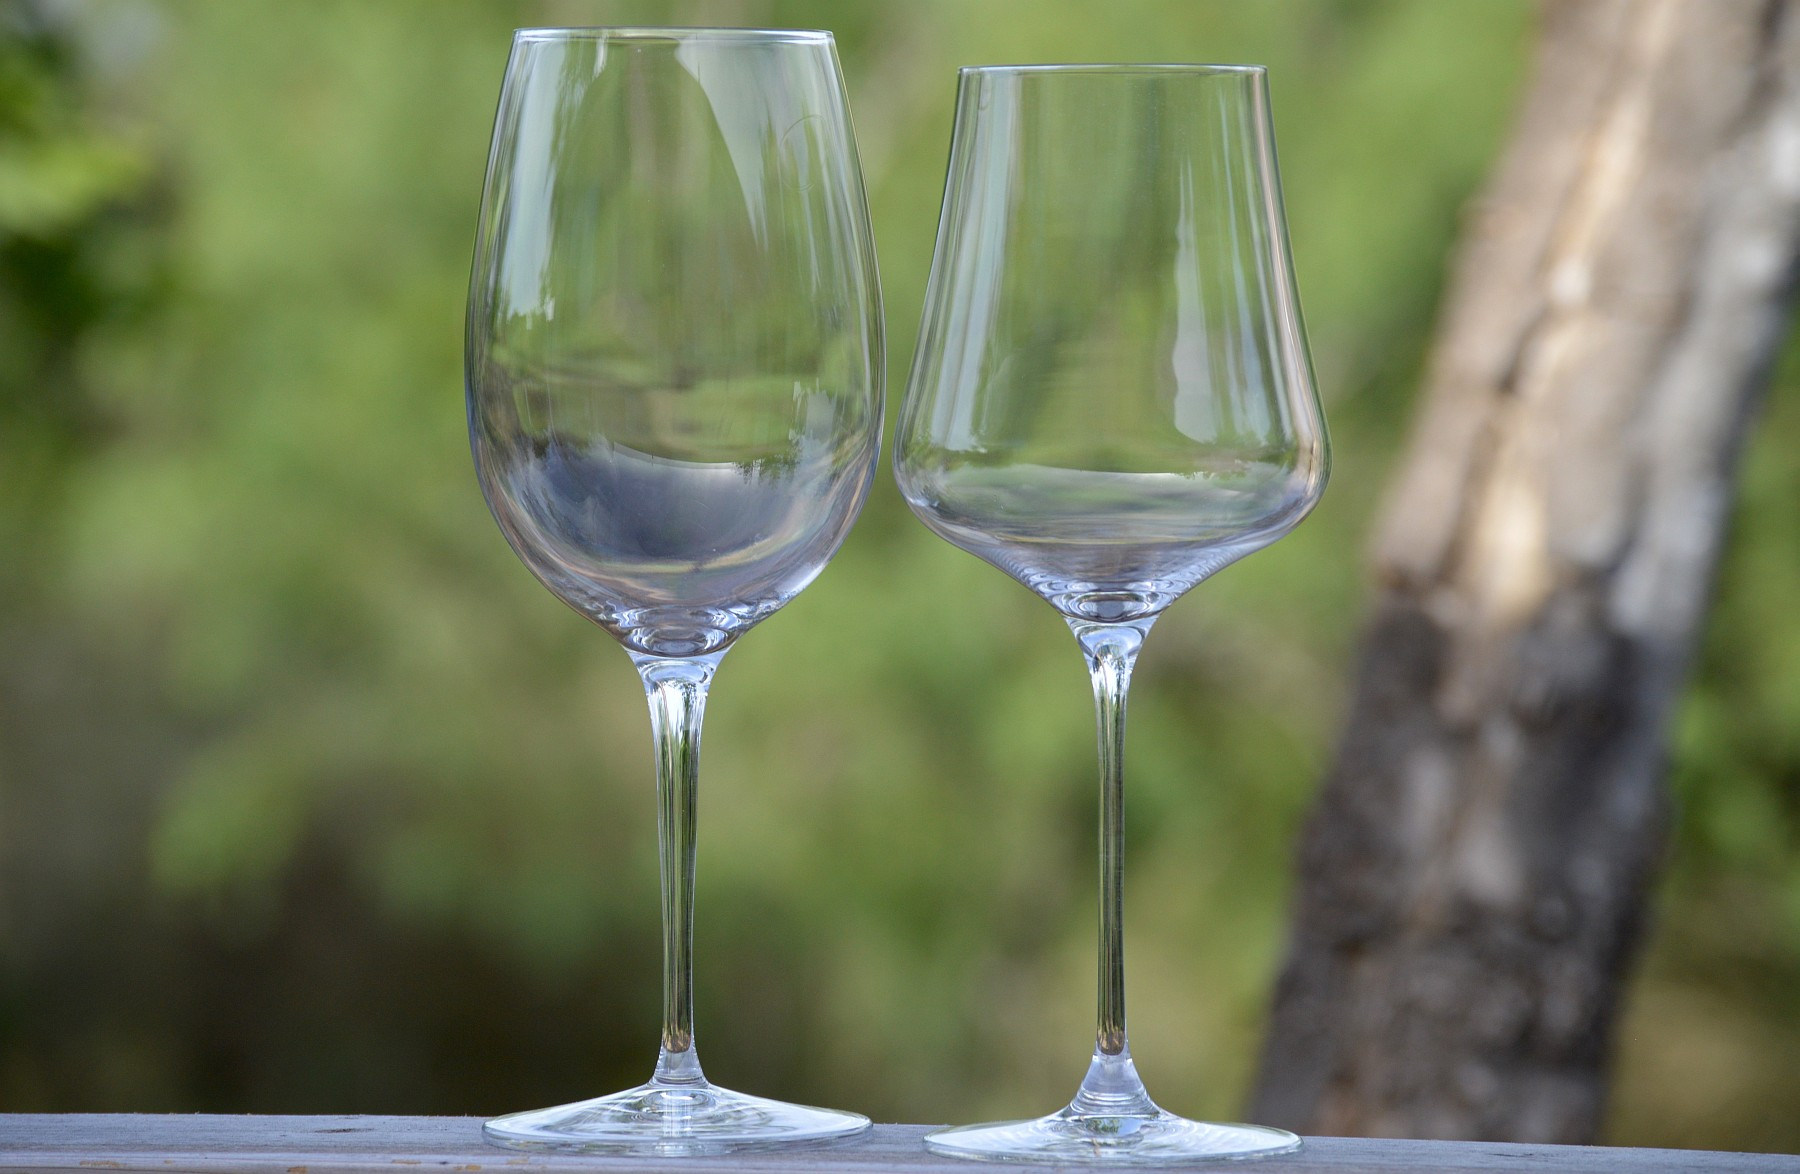 Luigi Bormioli on left and Gabriel-Glas on right